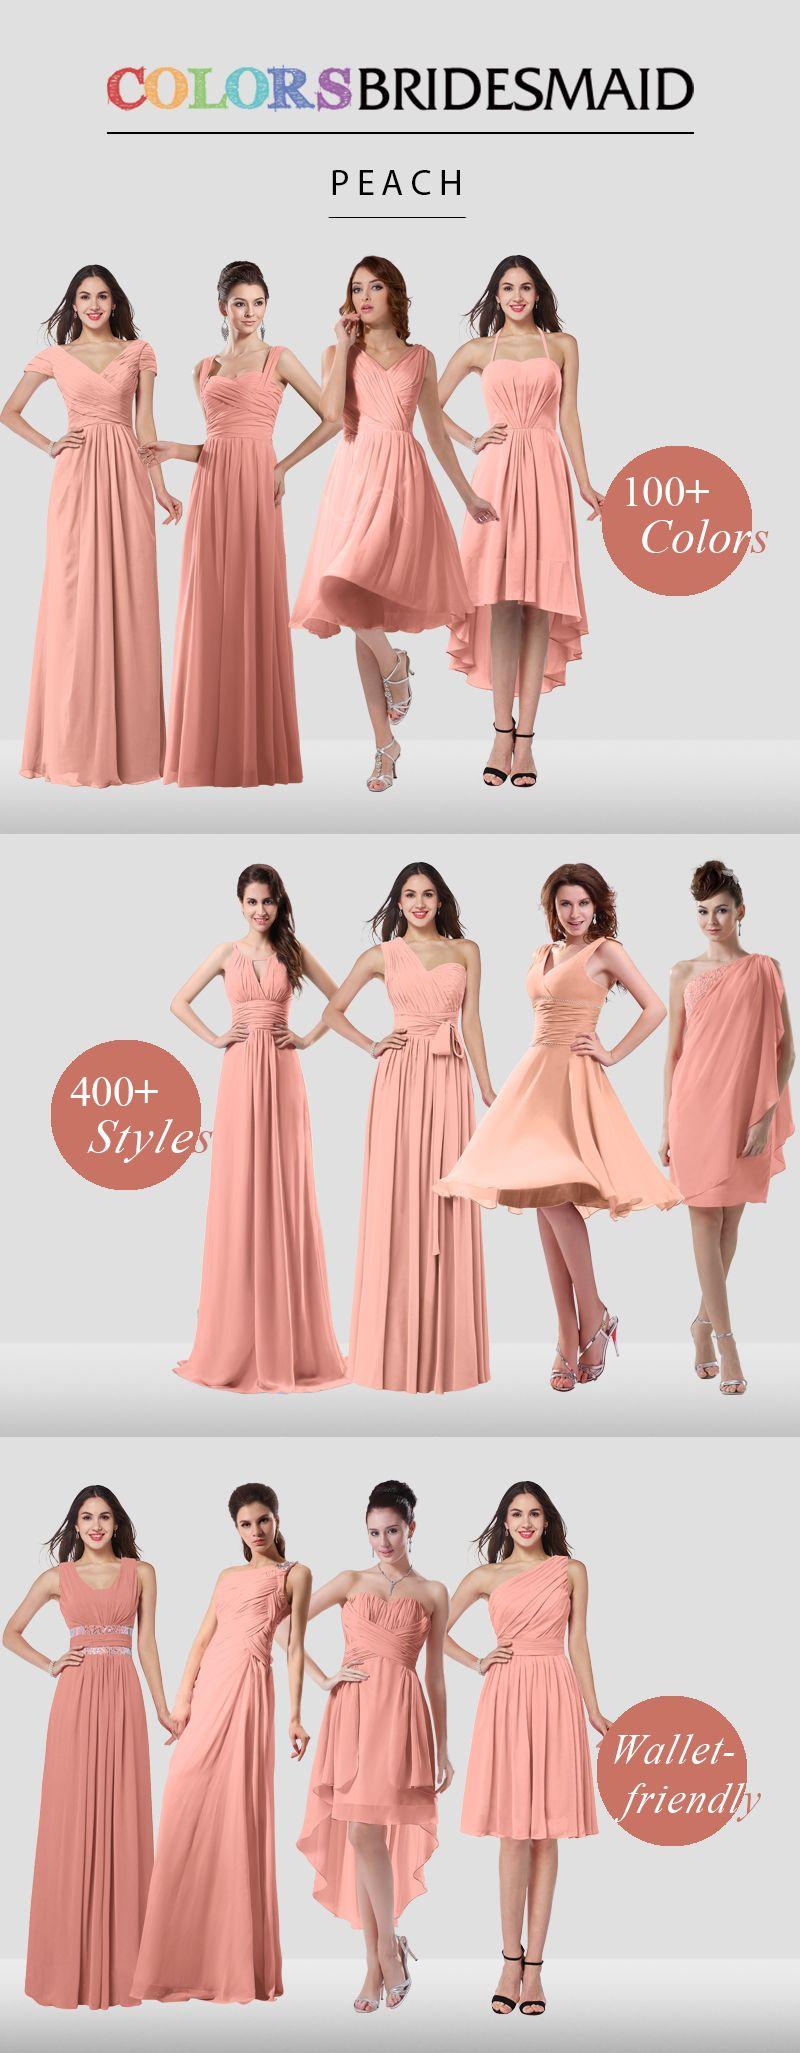 Hermosa Vestido De Novia De Girasol Modelo - Colección de Vestidos ...